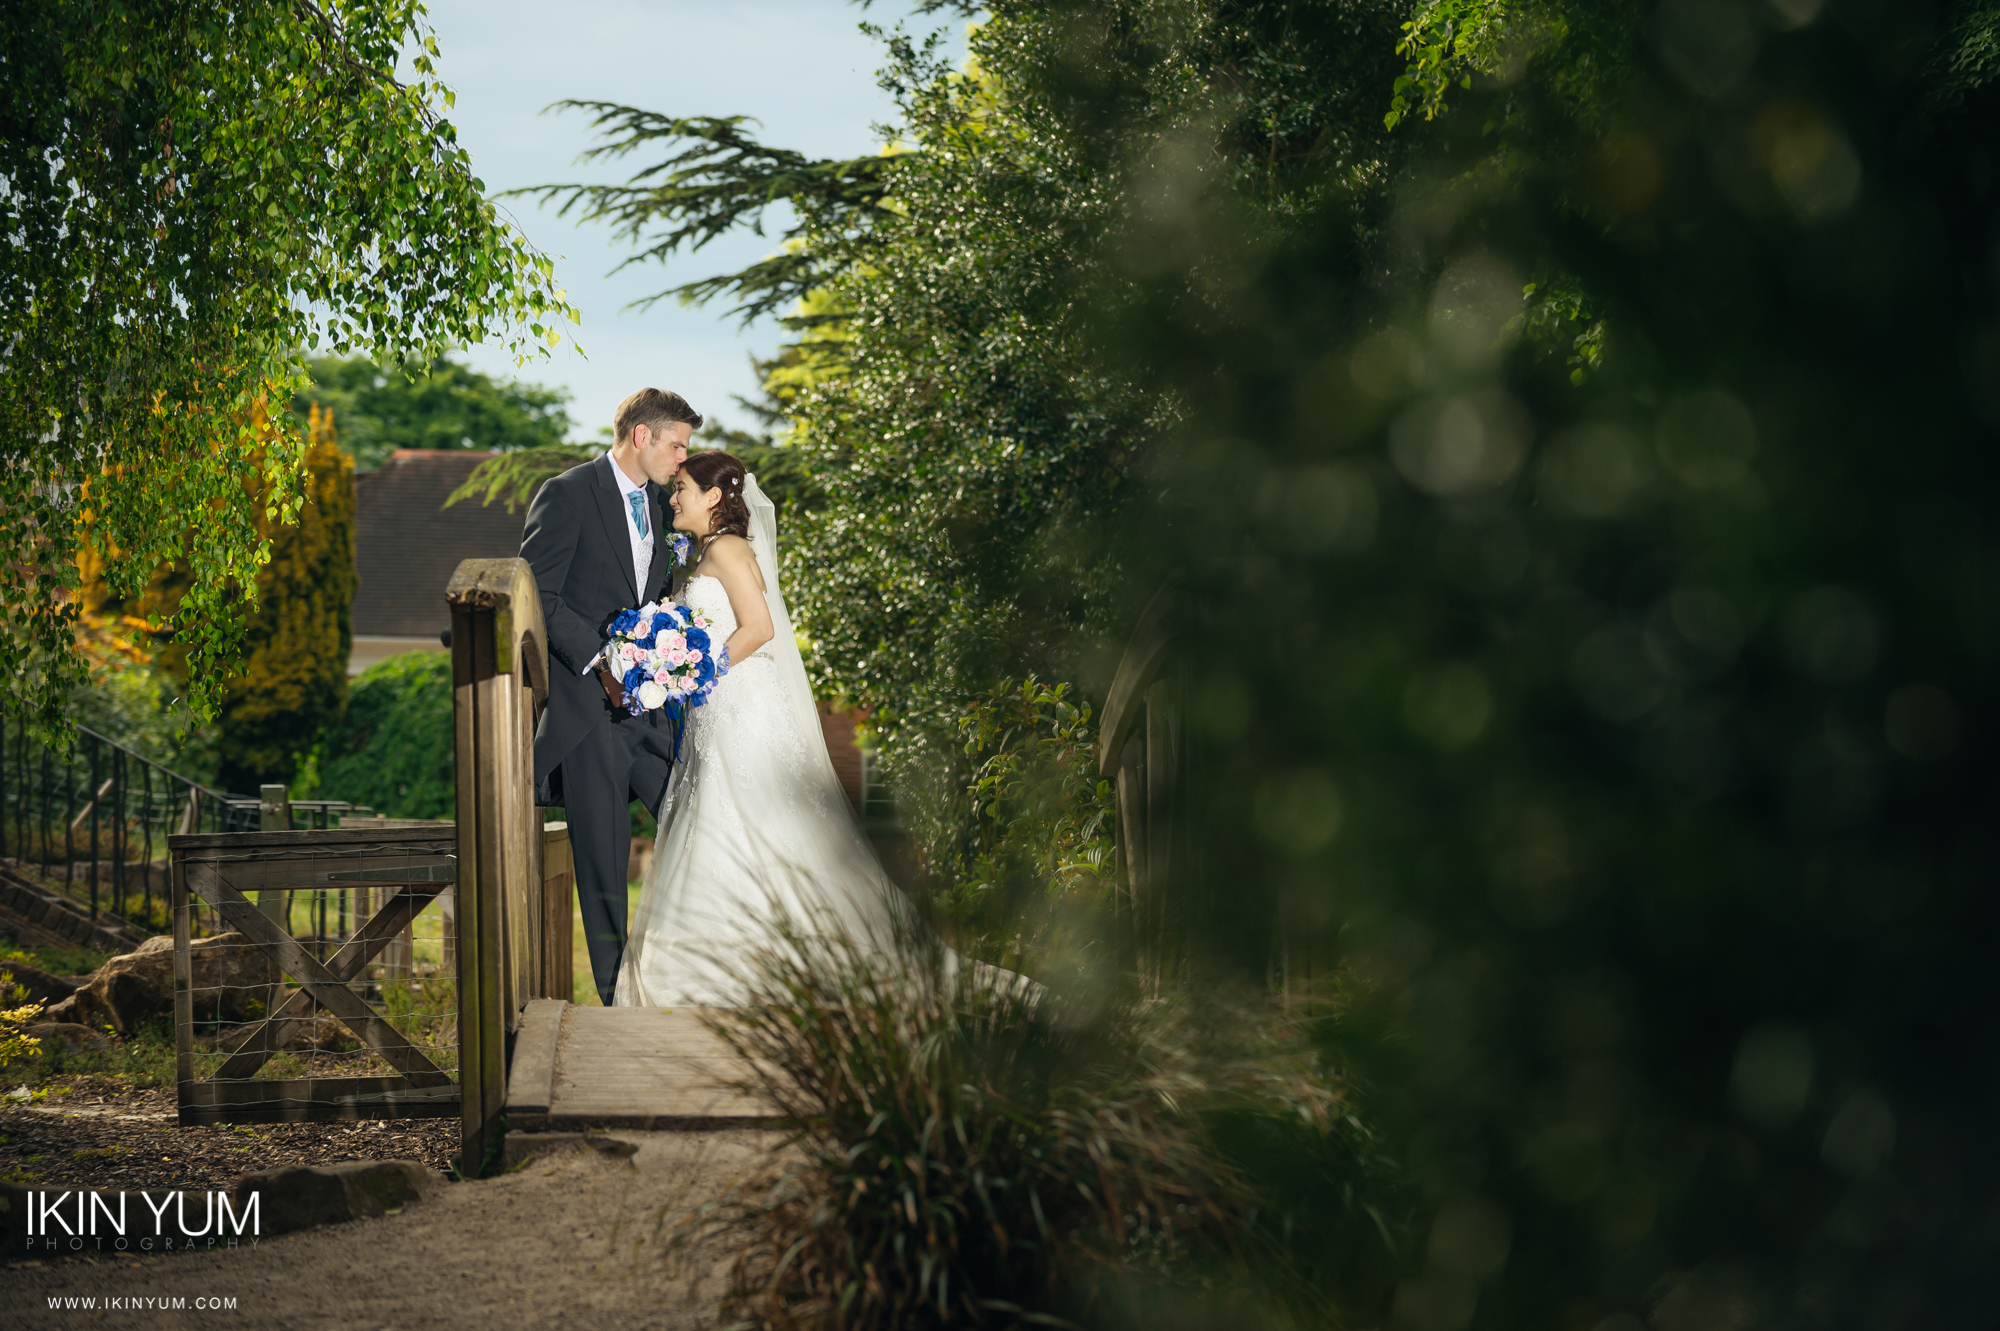 Teresa & Johnathan Weddong Day - Couple Photoshoot-0077.jpg